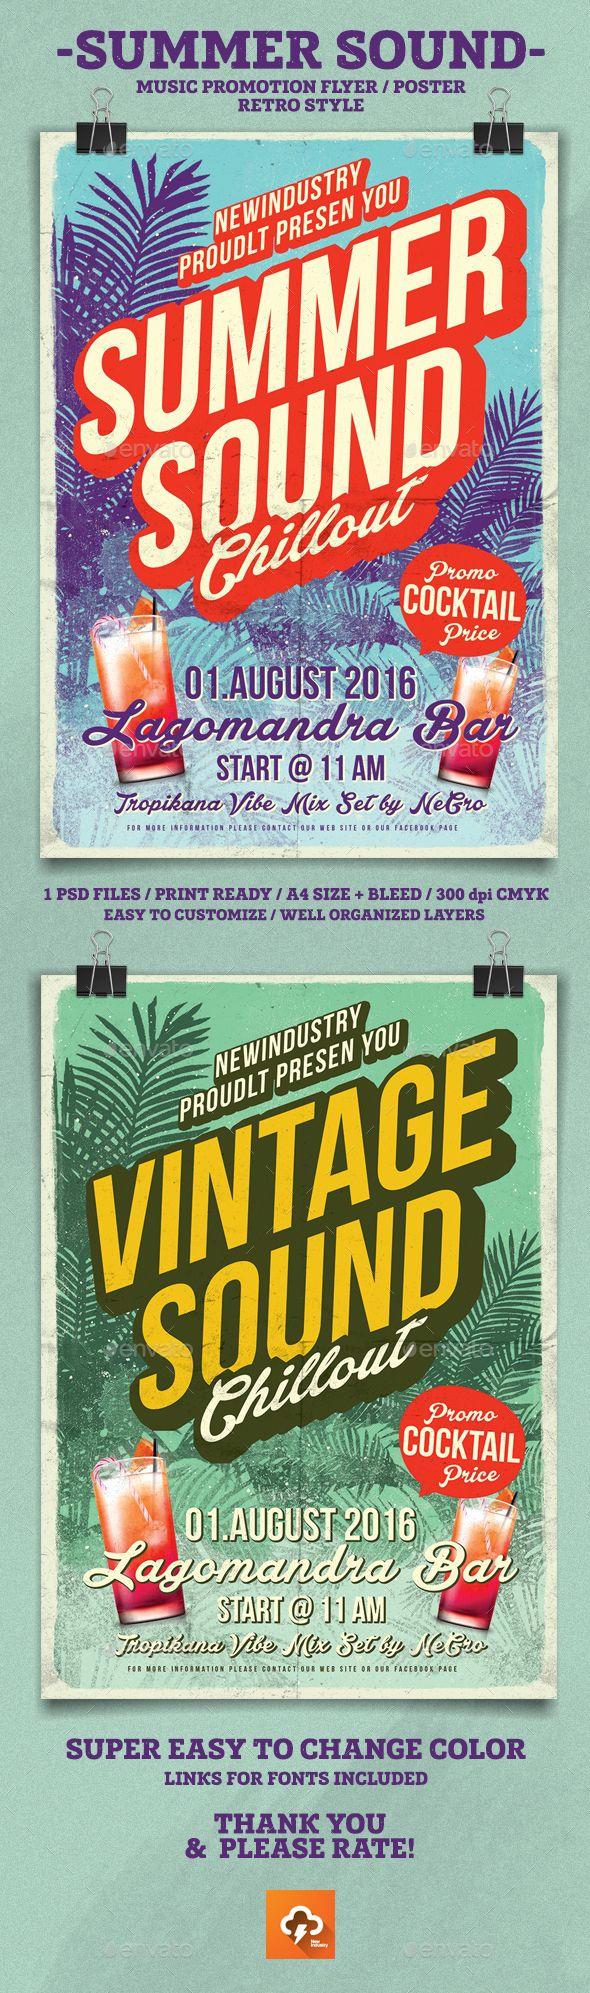 Summer Sound Poster / Flyer Template PSD. Download here: https://graphicriver.net/item/summer-sound-posterflyer/17091272?ref=ksioks